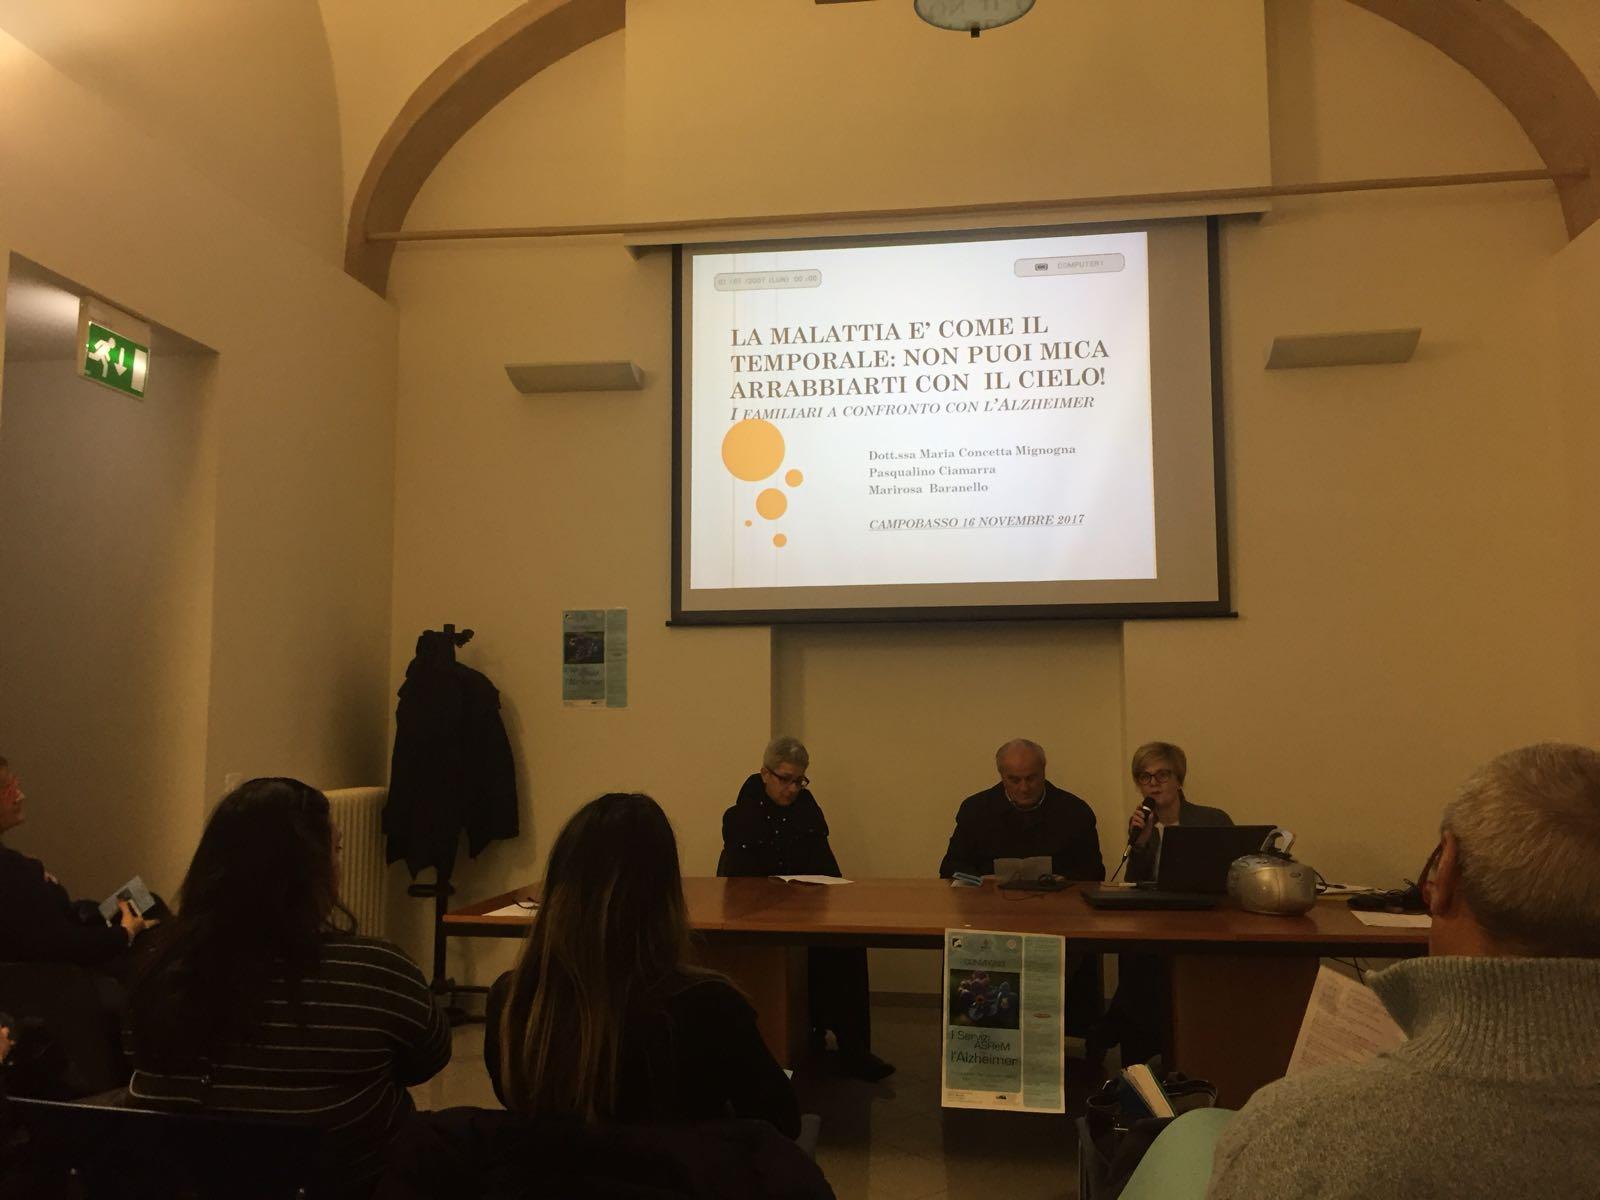 L'Alzheimer e i servizi Asrem in un convegno a Campobasso